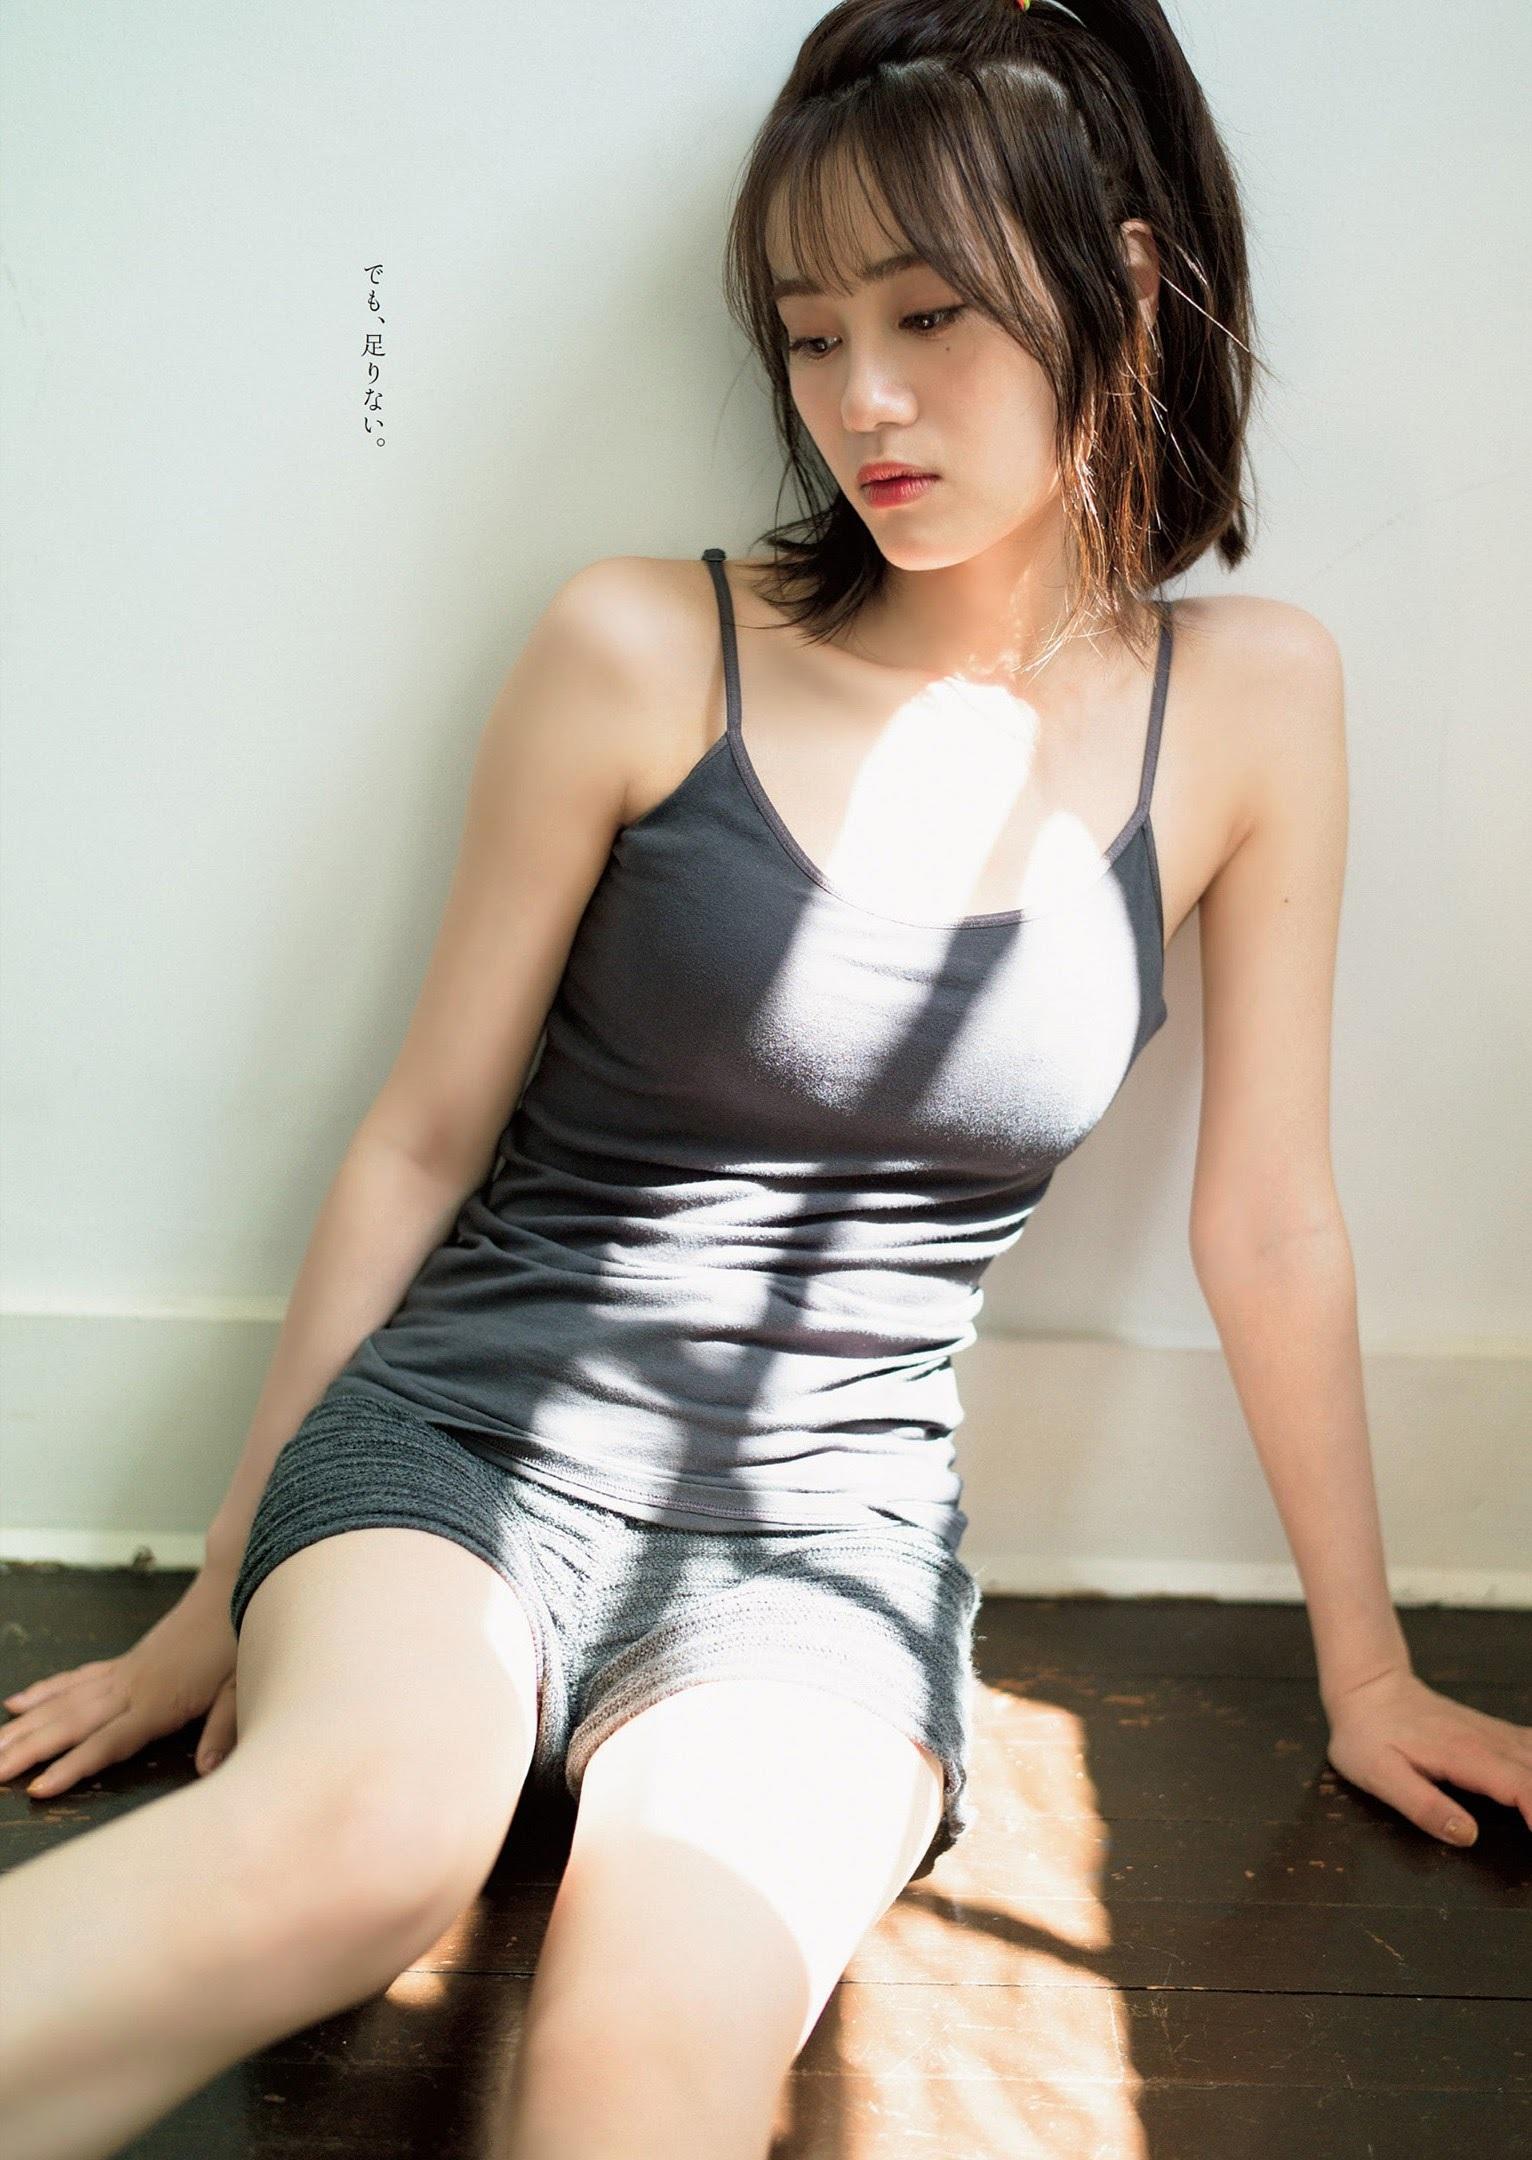 小山璃奈 頓知気さきな 伊藤美来-Weekly Playboy 2021年第十八期 高清套图 第46张